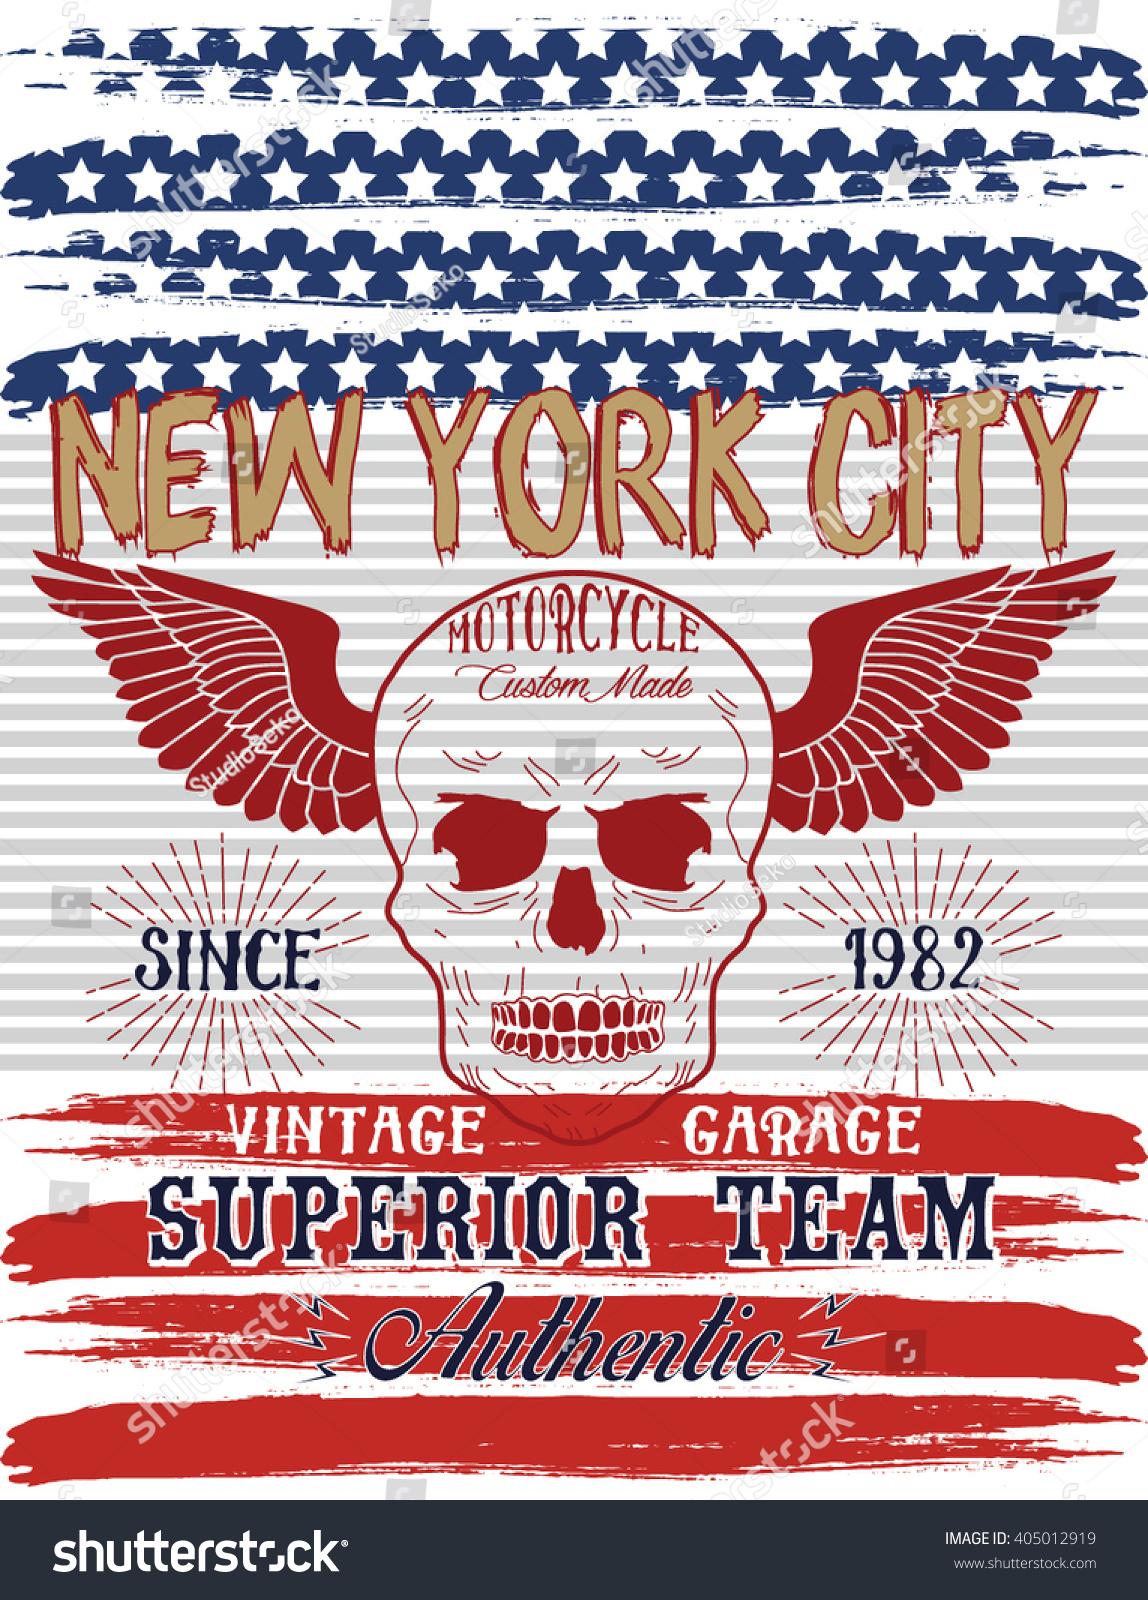 Nyc Motorcycle Vintage Garage American Flag Stock Vector Royalty Free 405012919